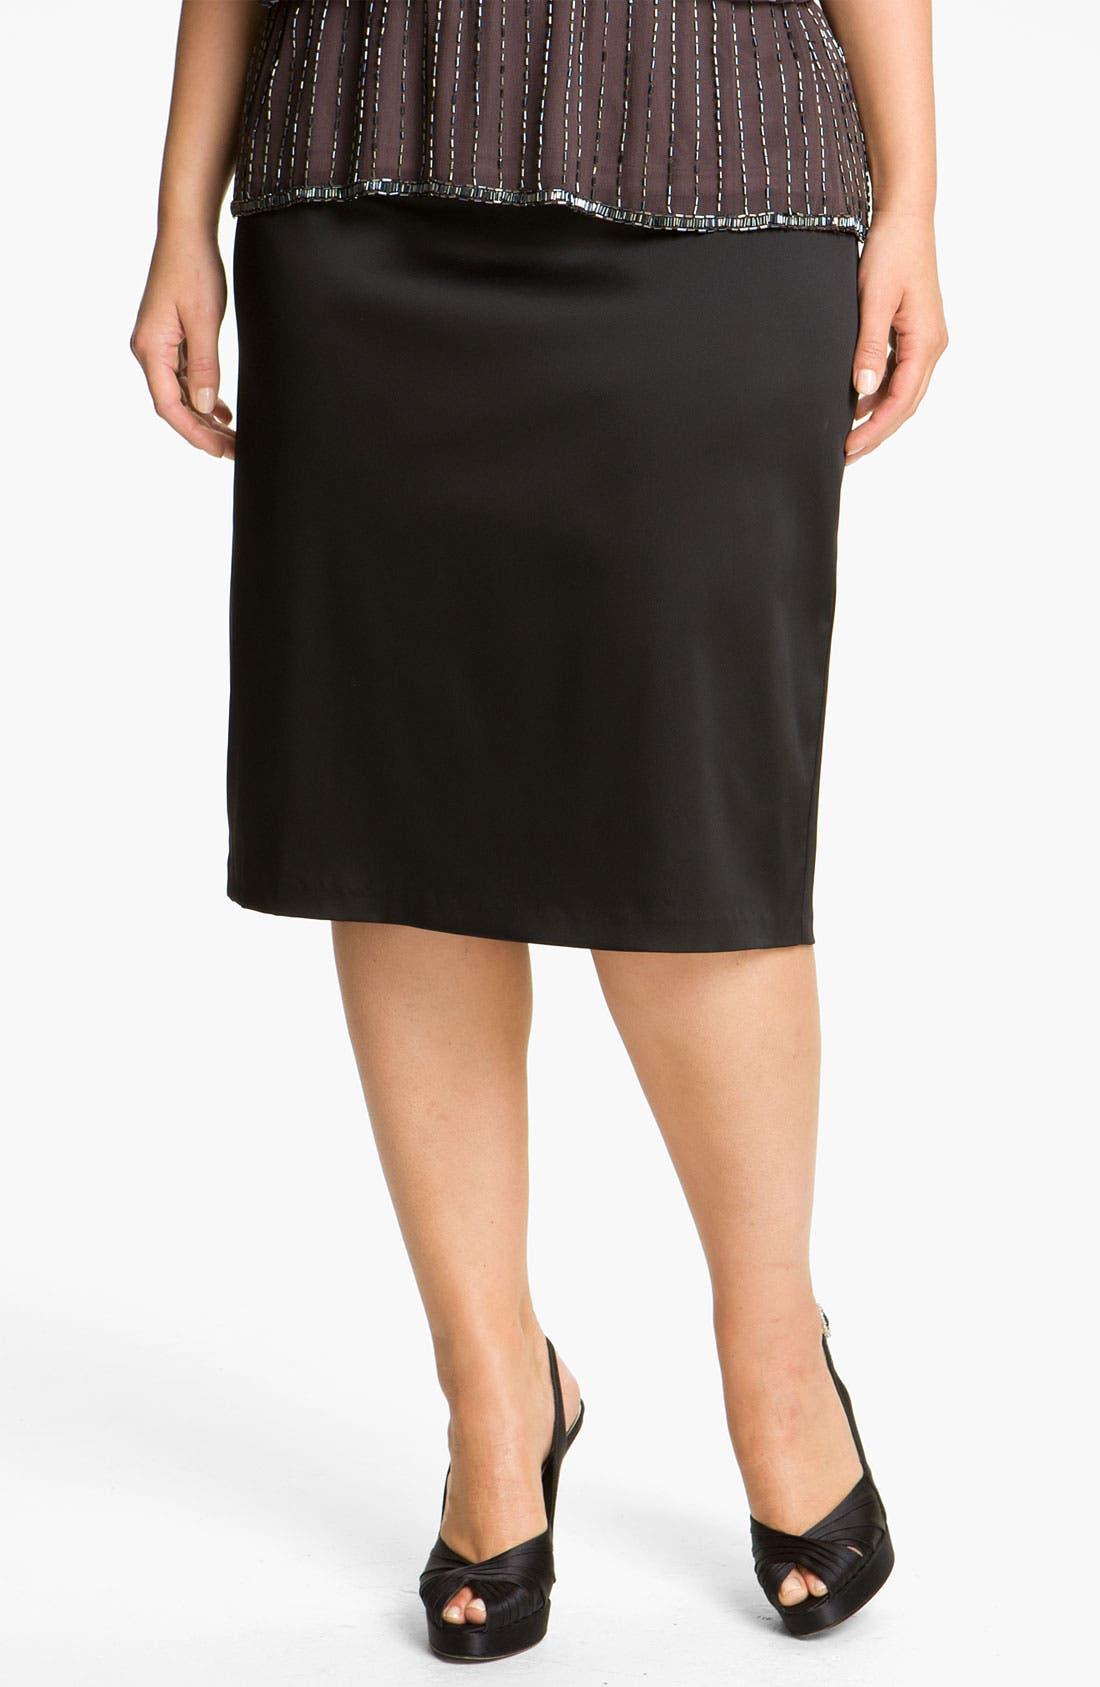 Alternate Image 1 Selected - Alex Evenings Satin Pencil Skirt (Plus)